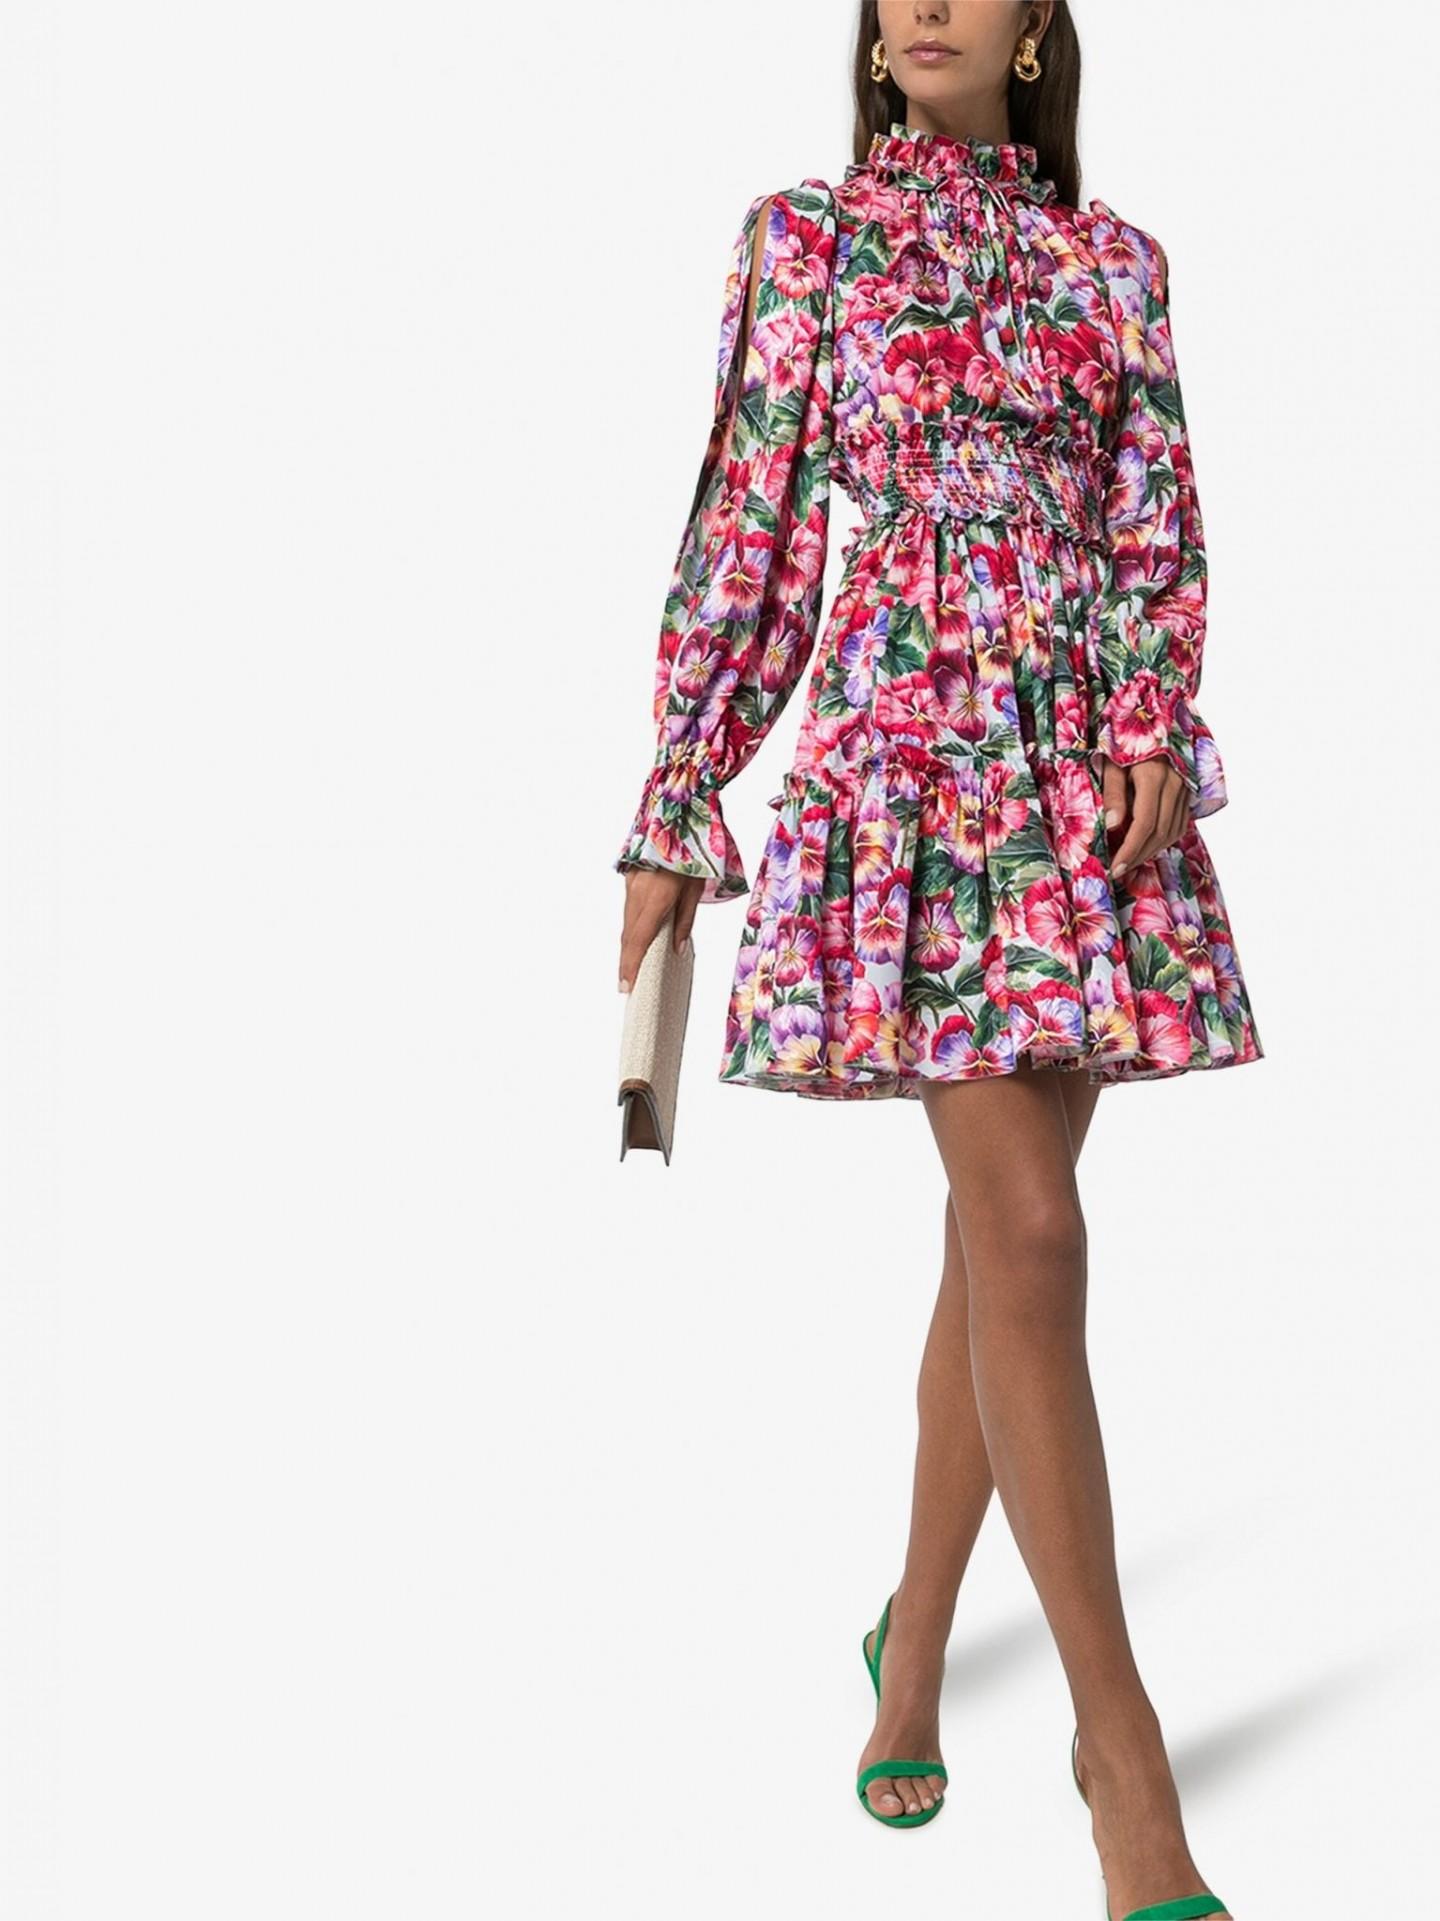 DOLCE & GABBANA Floral Print Silk Mini Dress